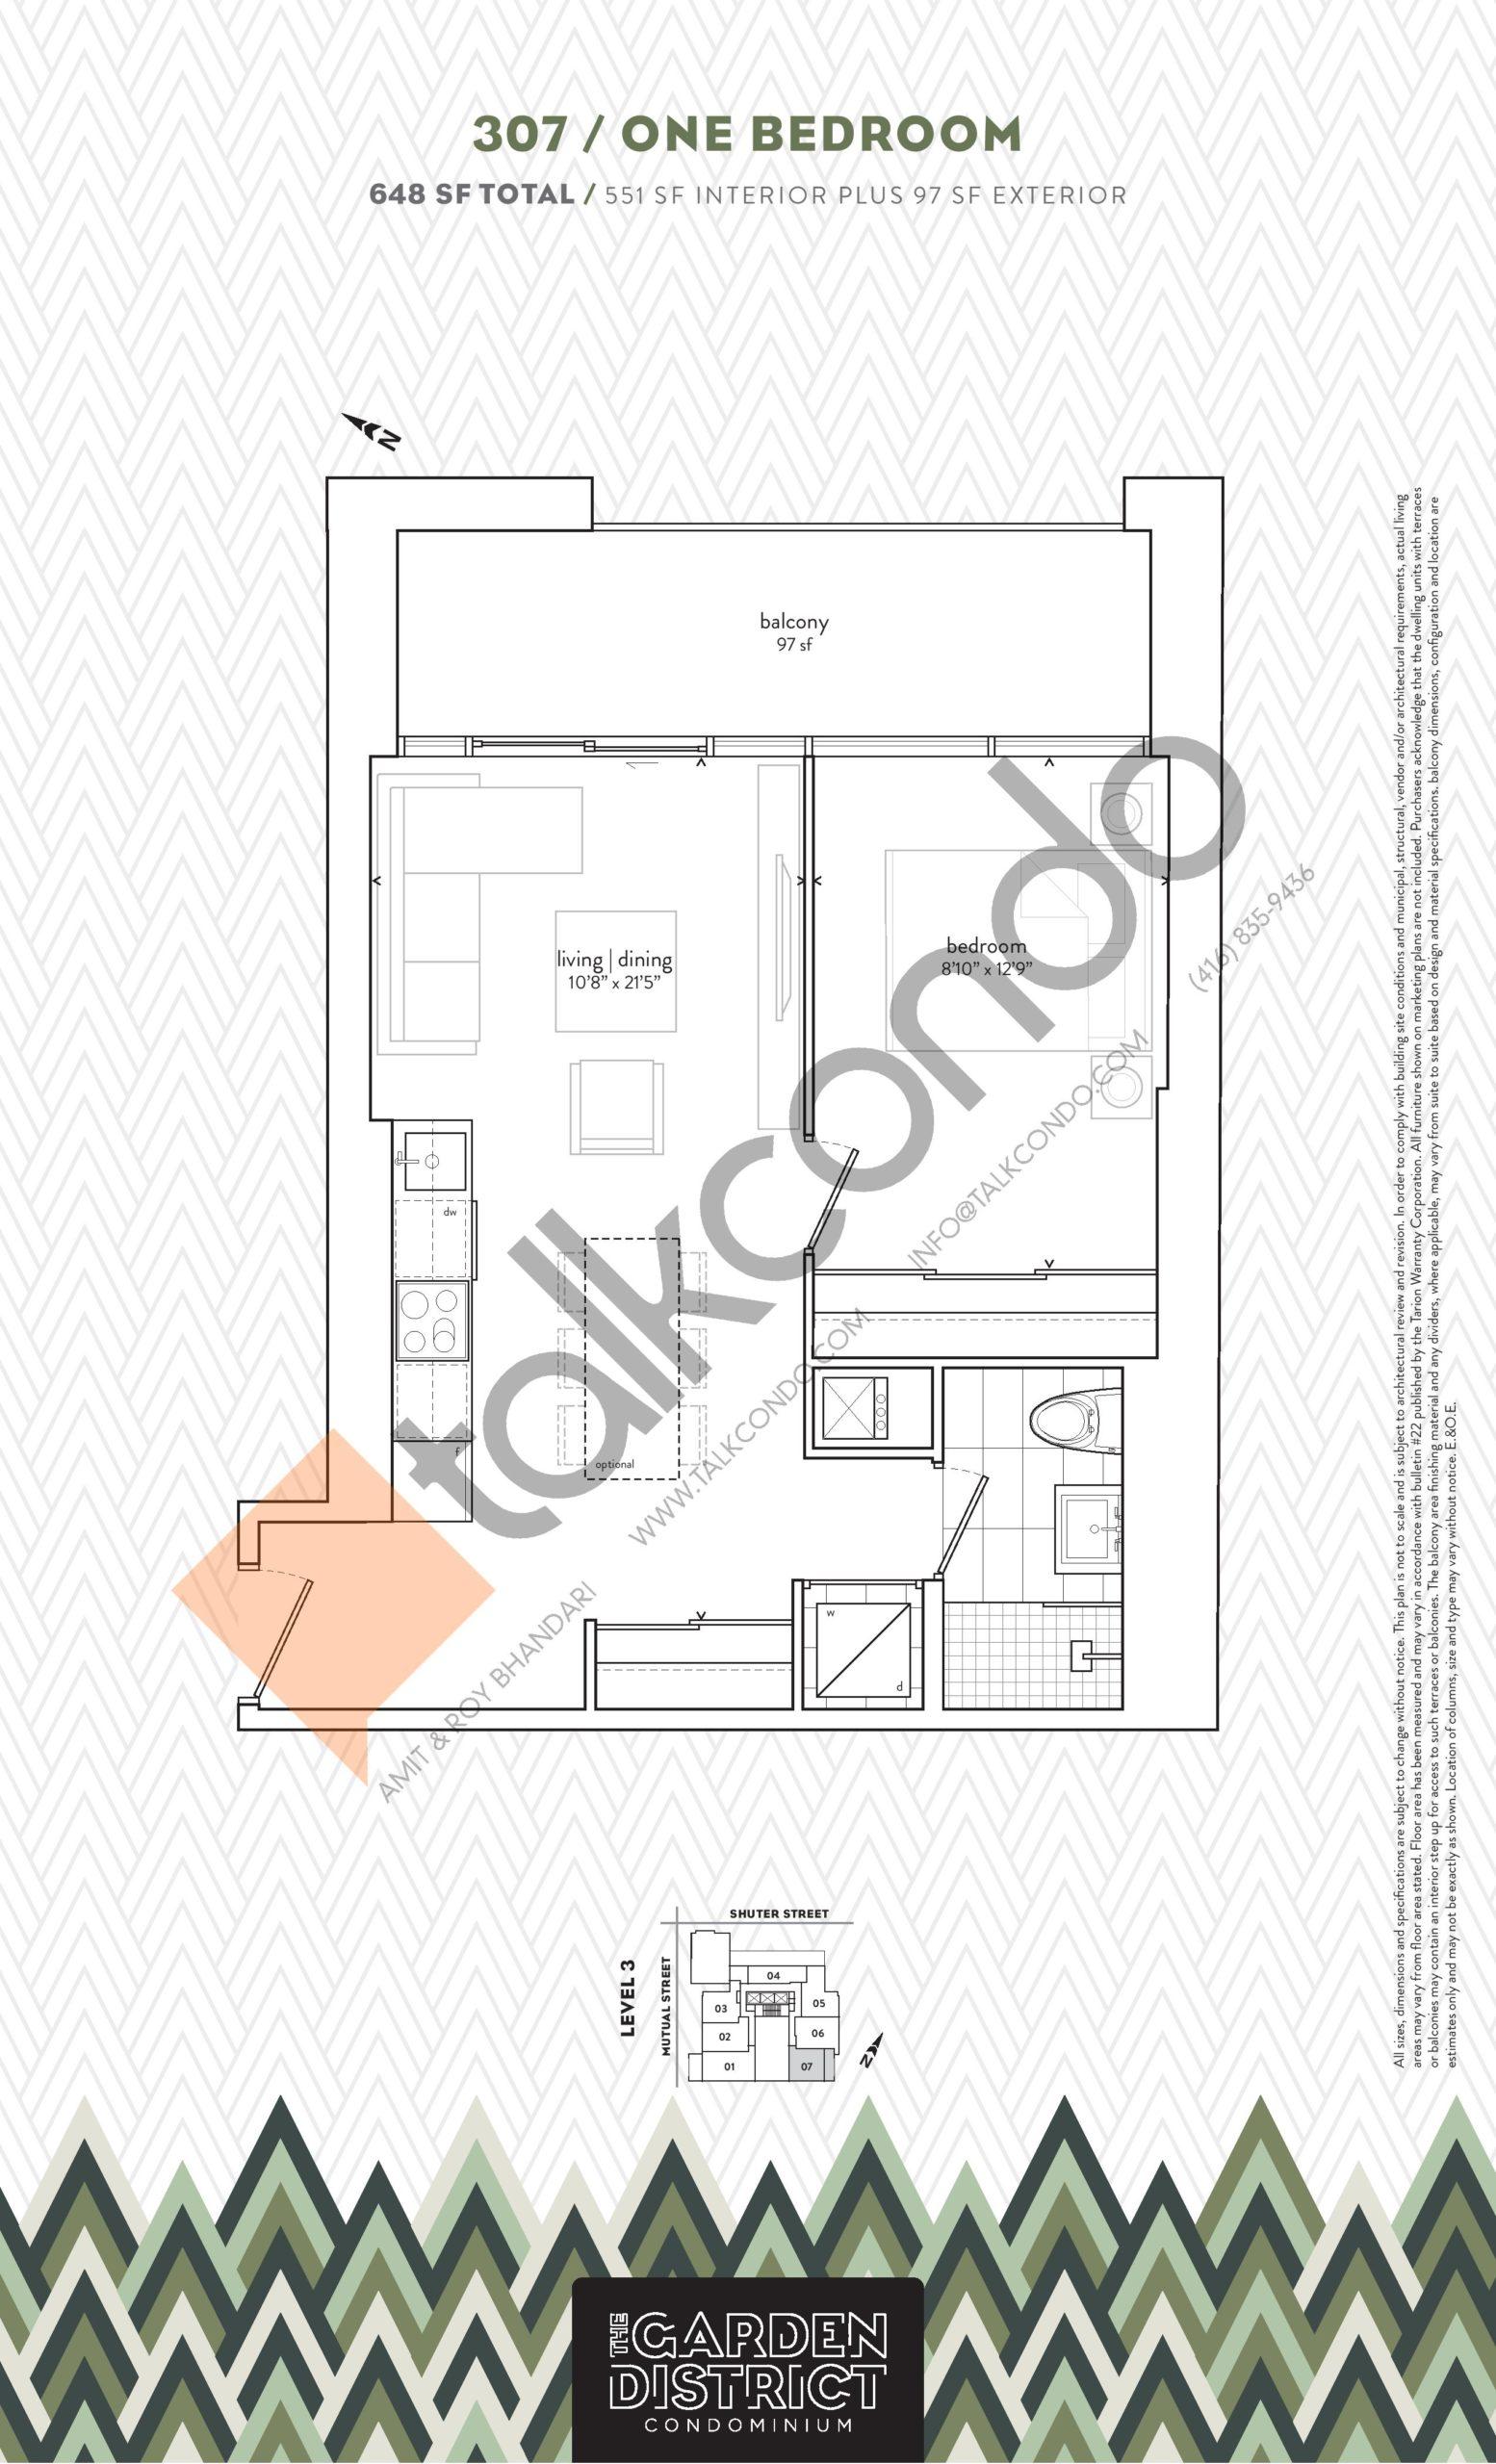 307 Floor Plan at Garden District Condos - 551 sq.ft